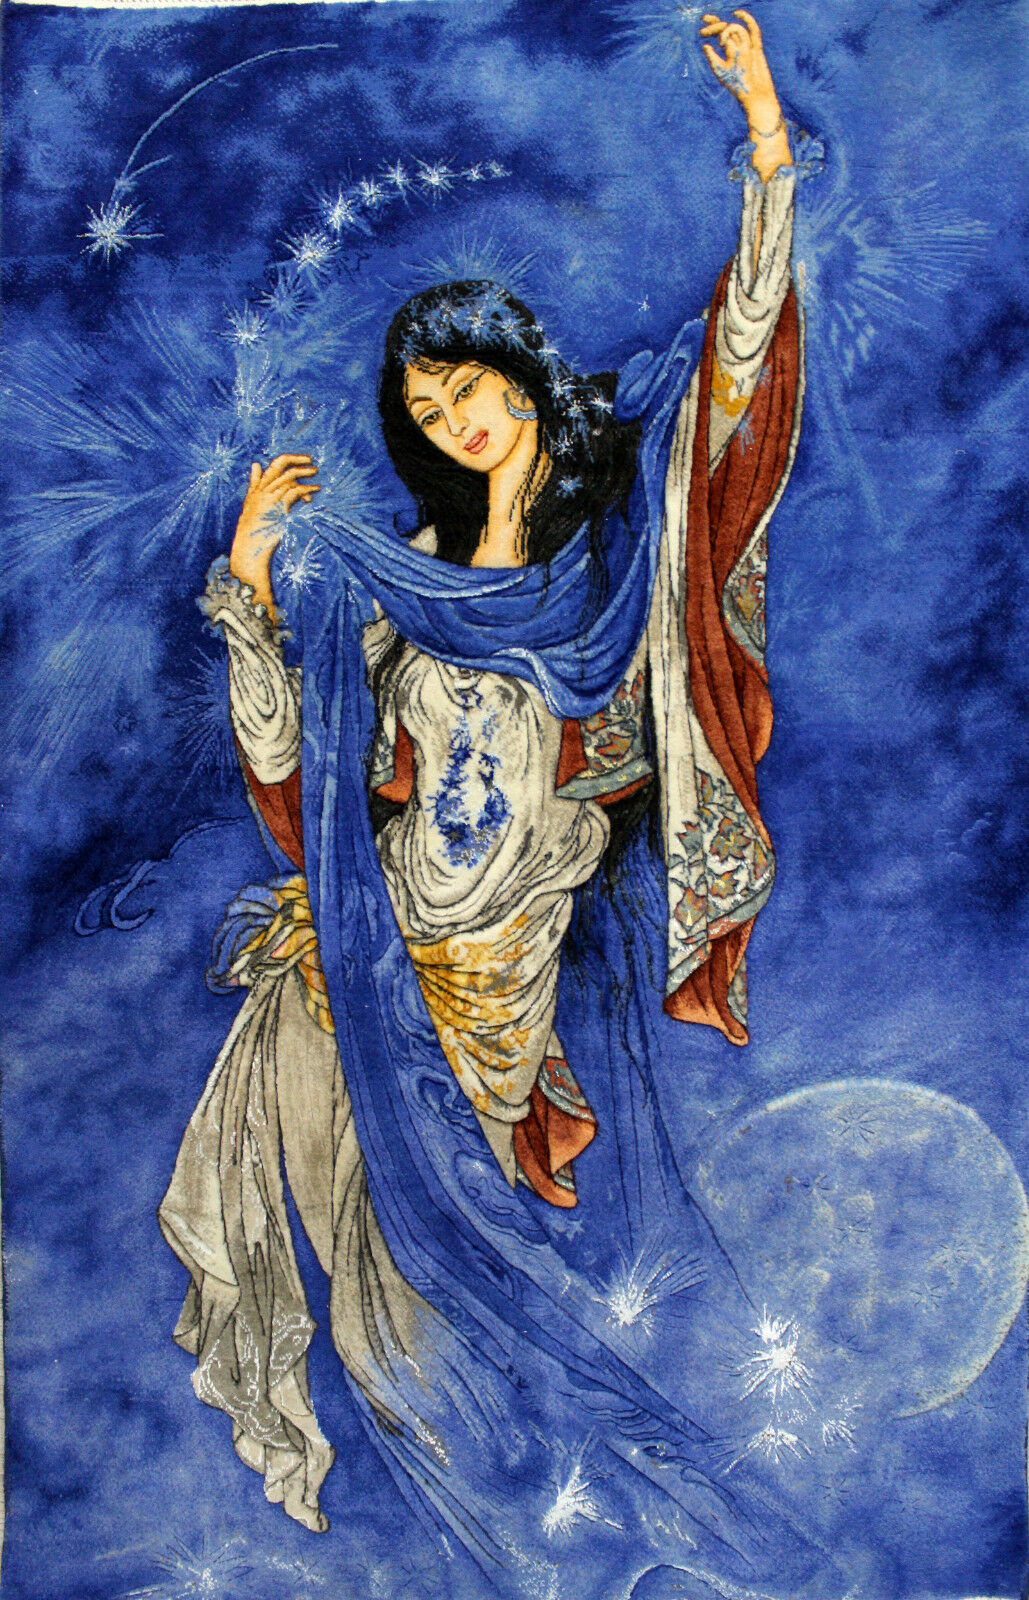 2'7″W x 4'1″H Handmade Wool and Silk MORNING STAR FARSHCHIAN Persian Tableau Rug Tapestry Wall Hanging 12980815